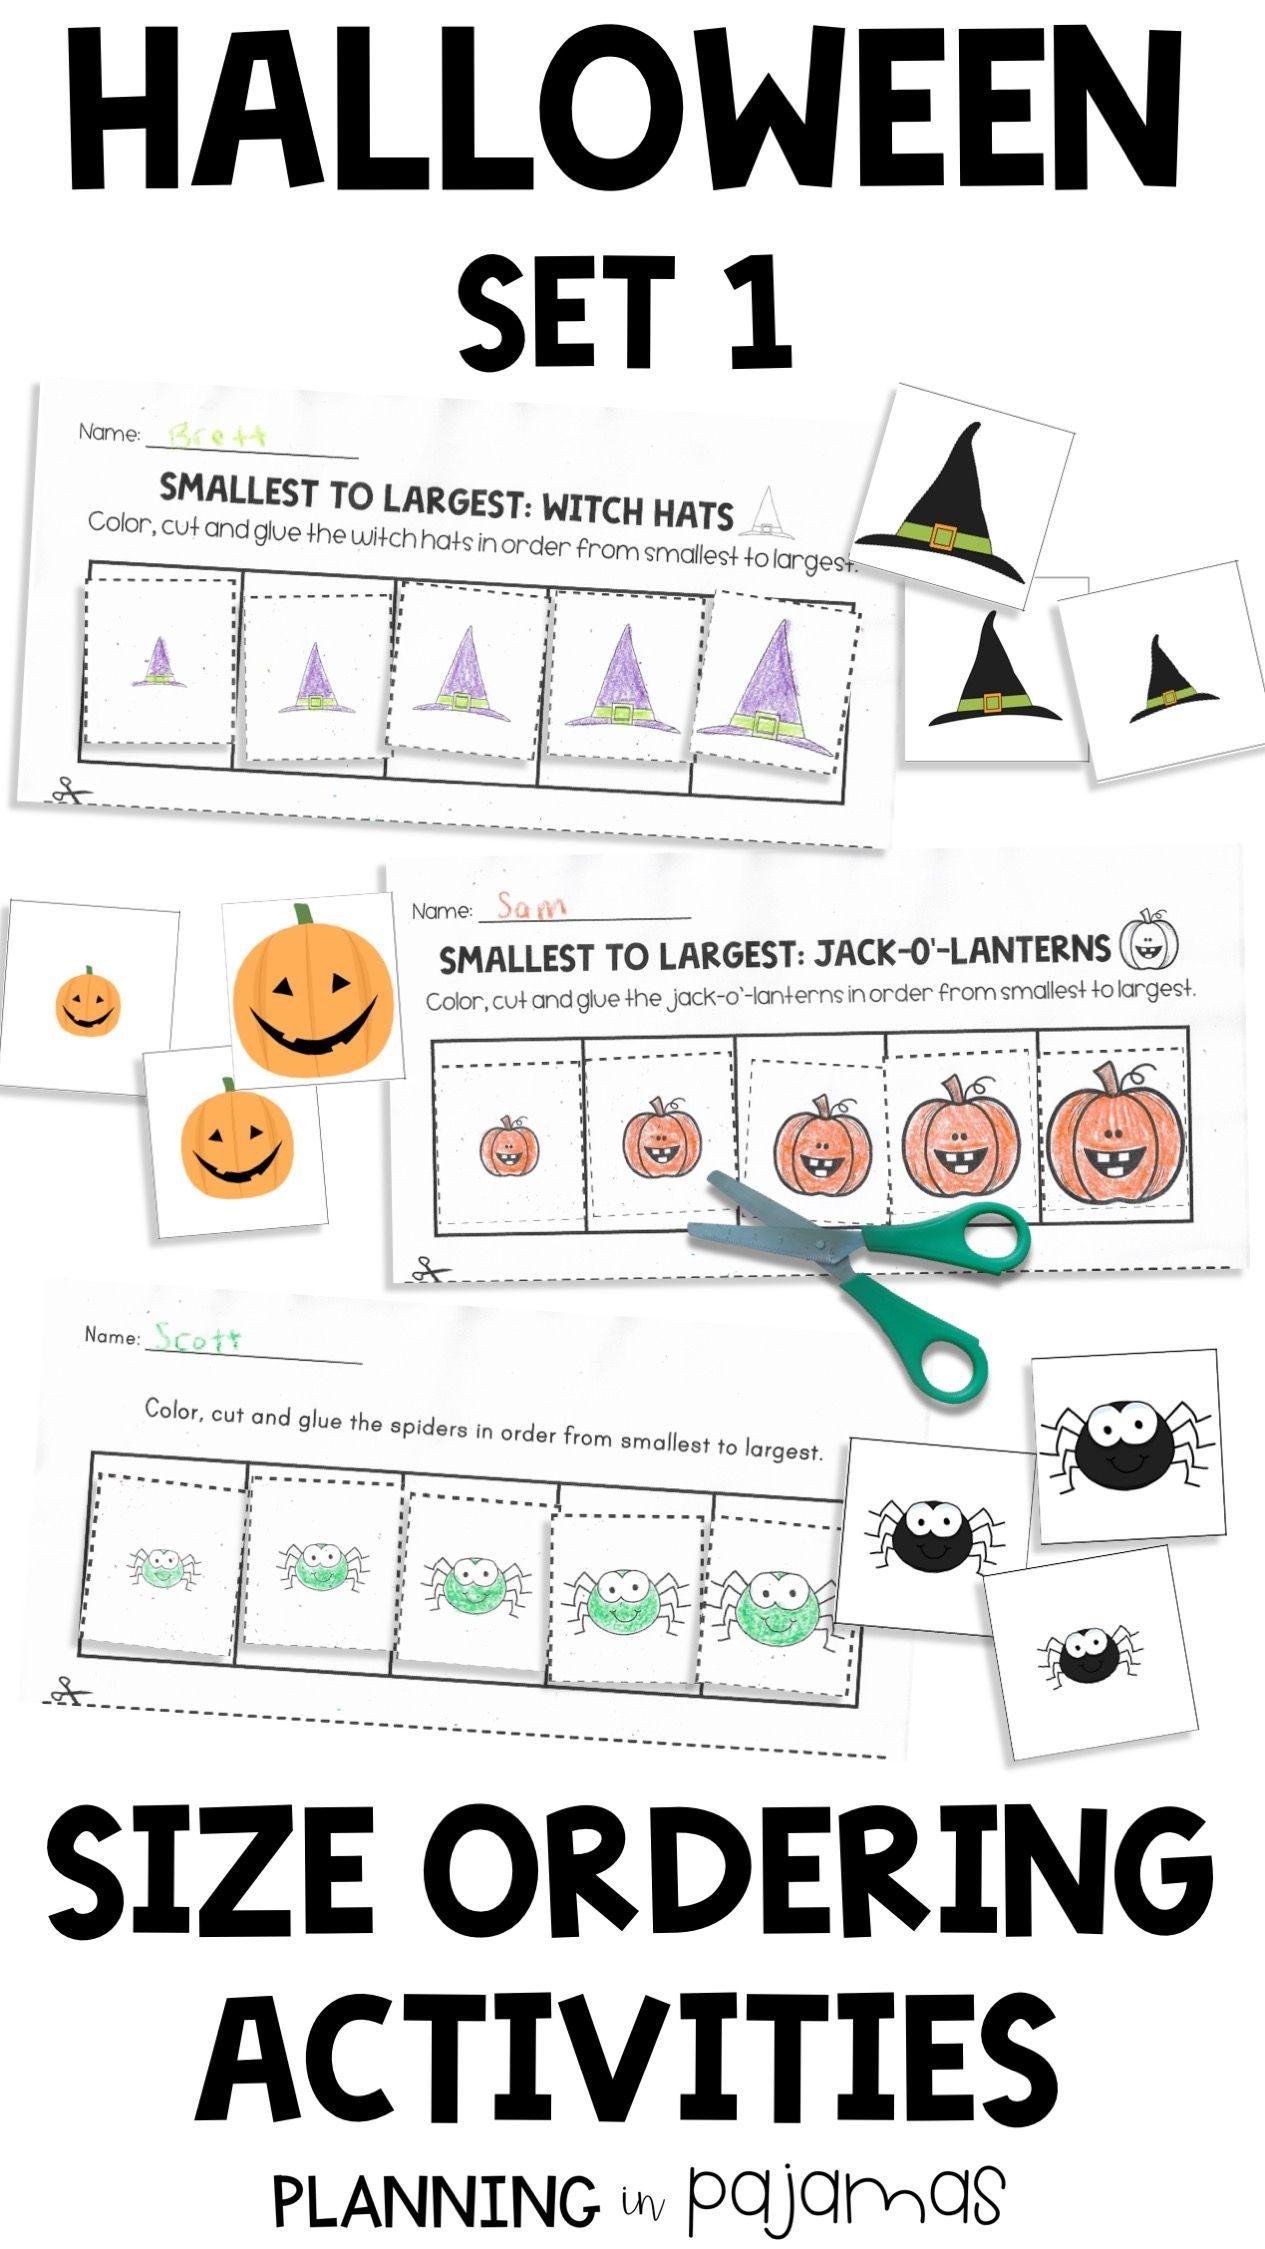 Halloween Size Ordering Set 1